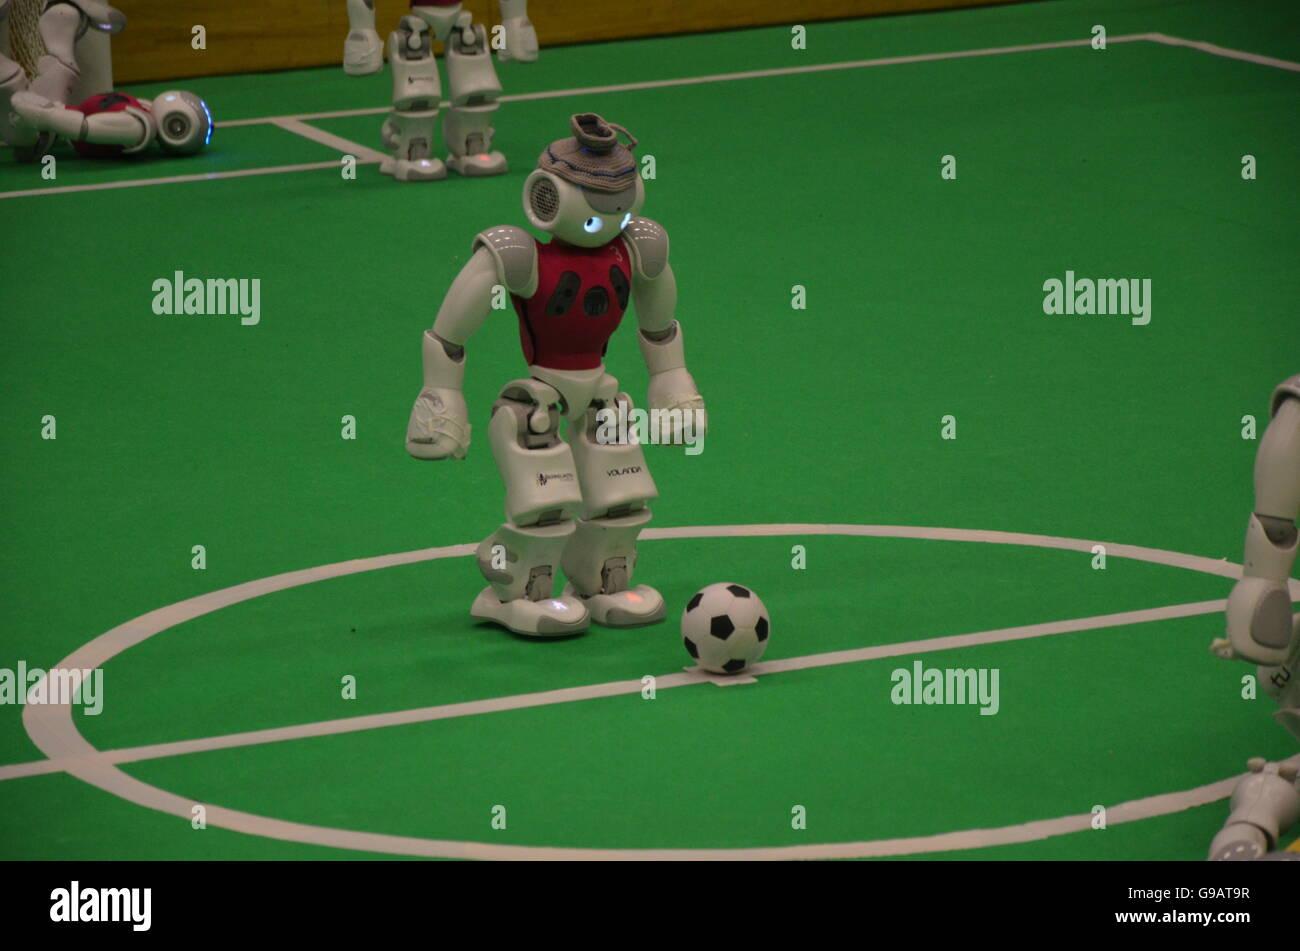 Robot automazione binär cartoni animati cocosnuss computer